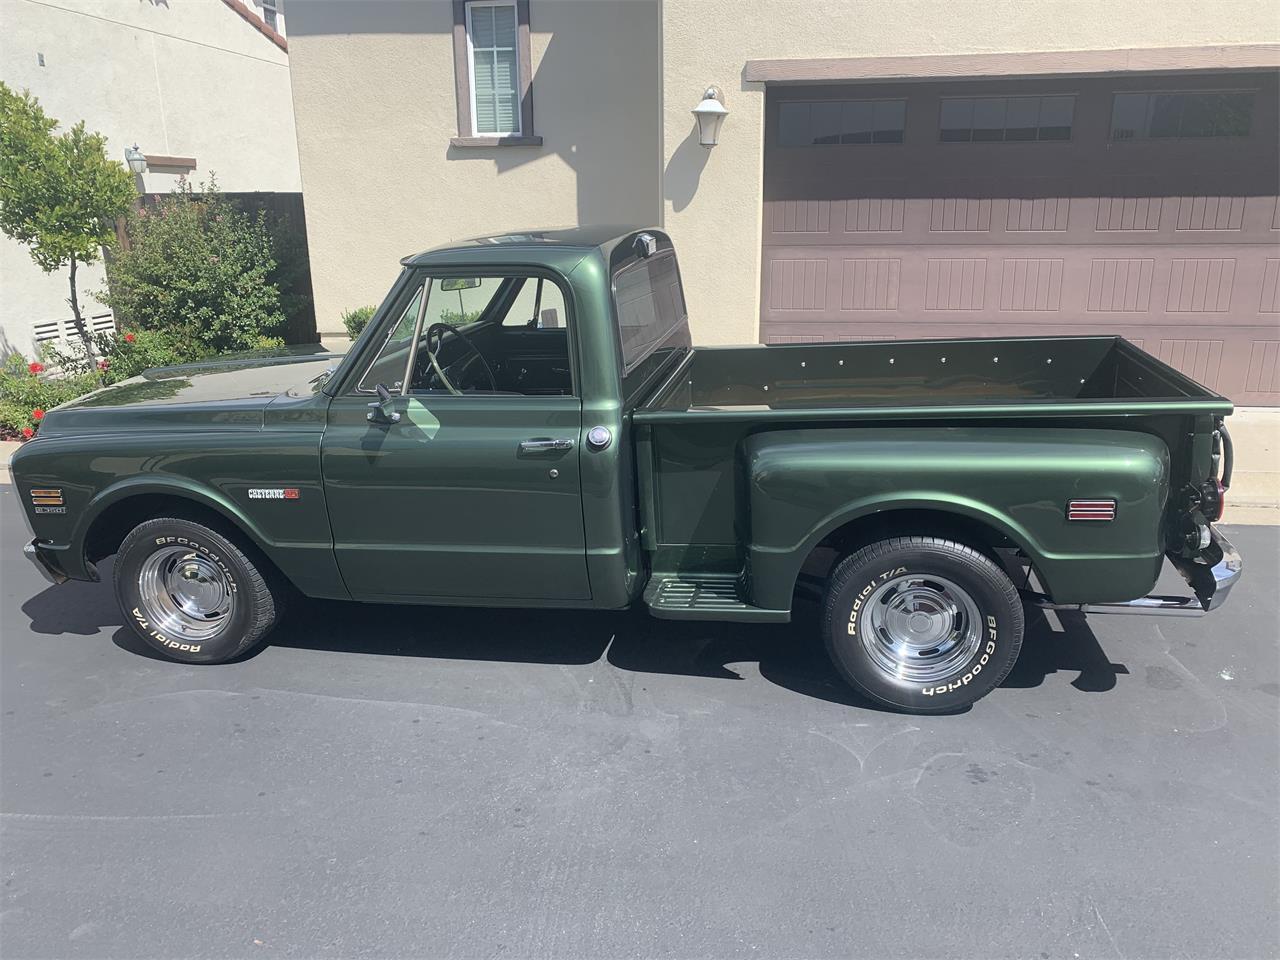 1972 Chevrolet Cheyenne (CC-1241491) for sale in San Ramon, California